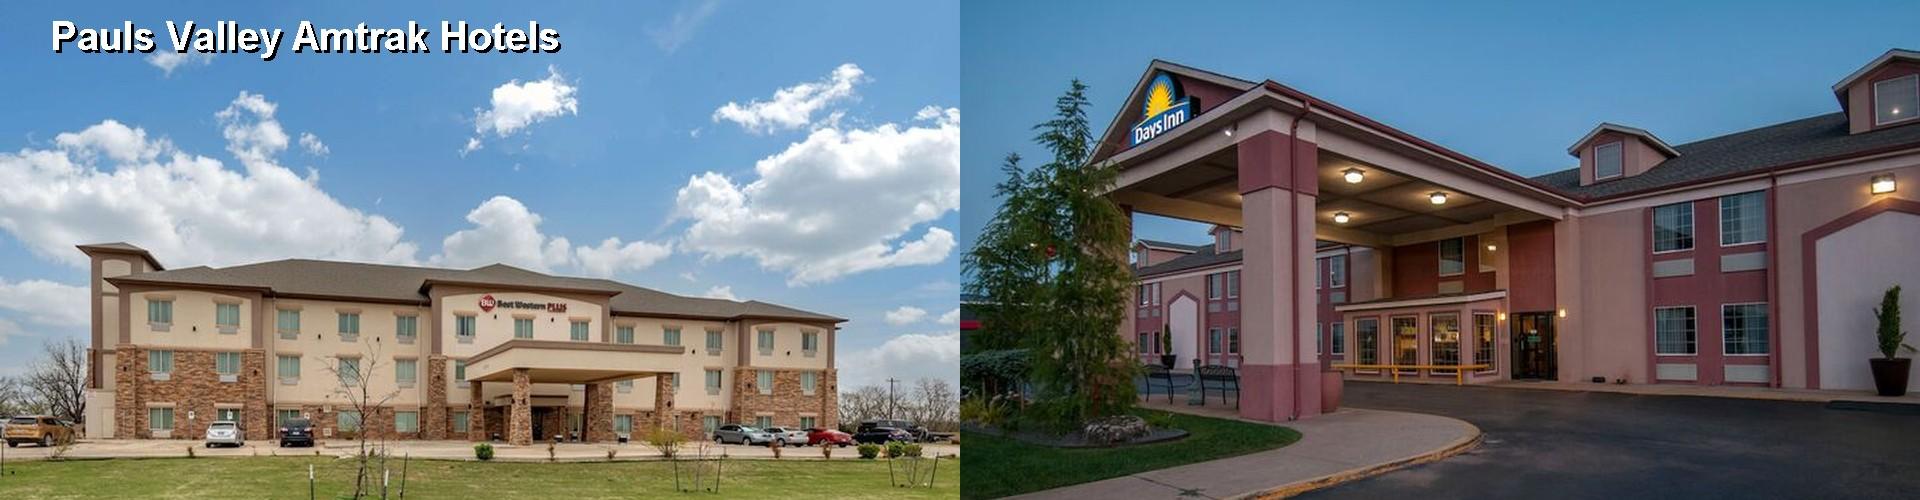 5 Best Hotels Near Pauls Valley Amtrak